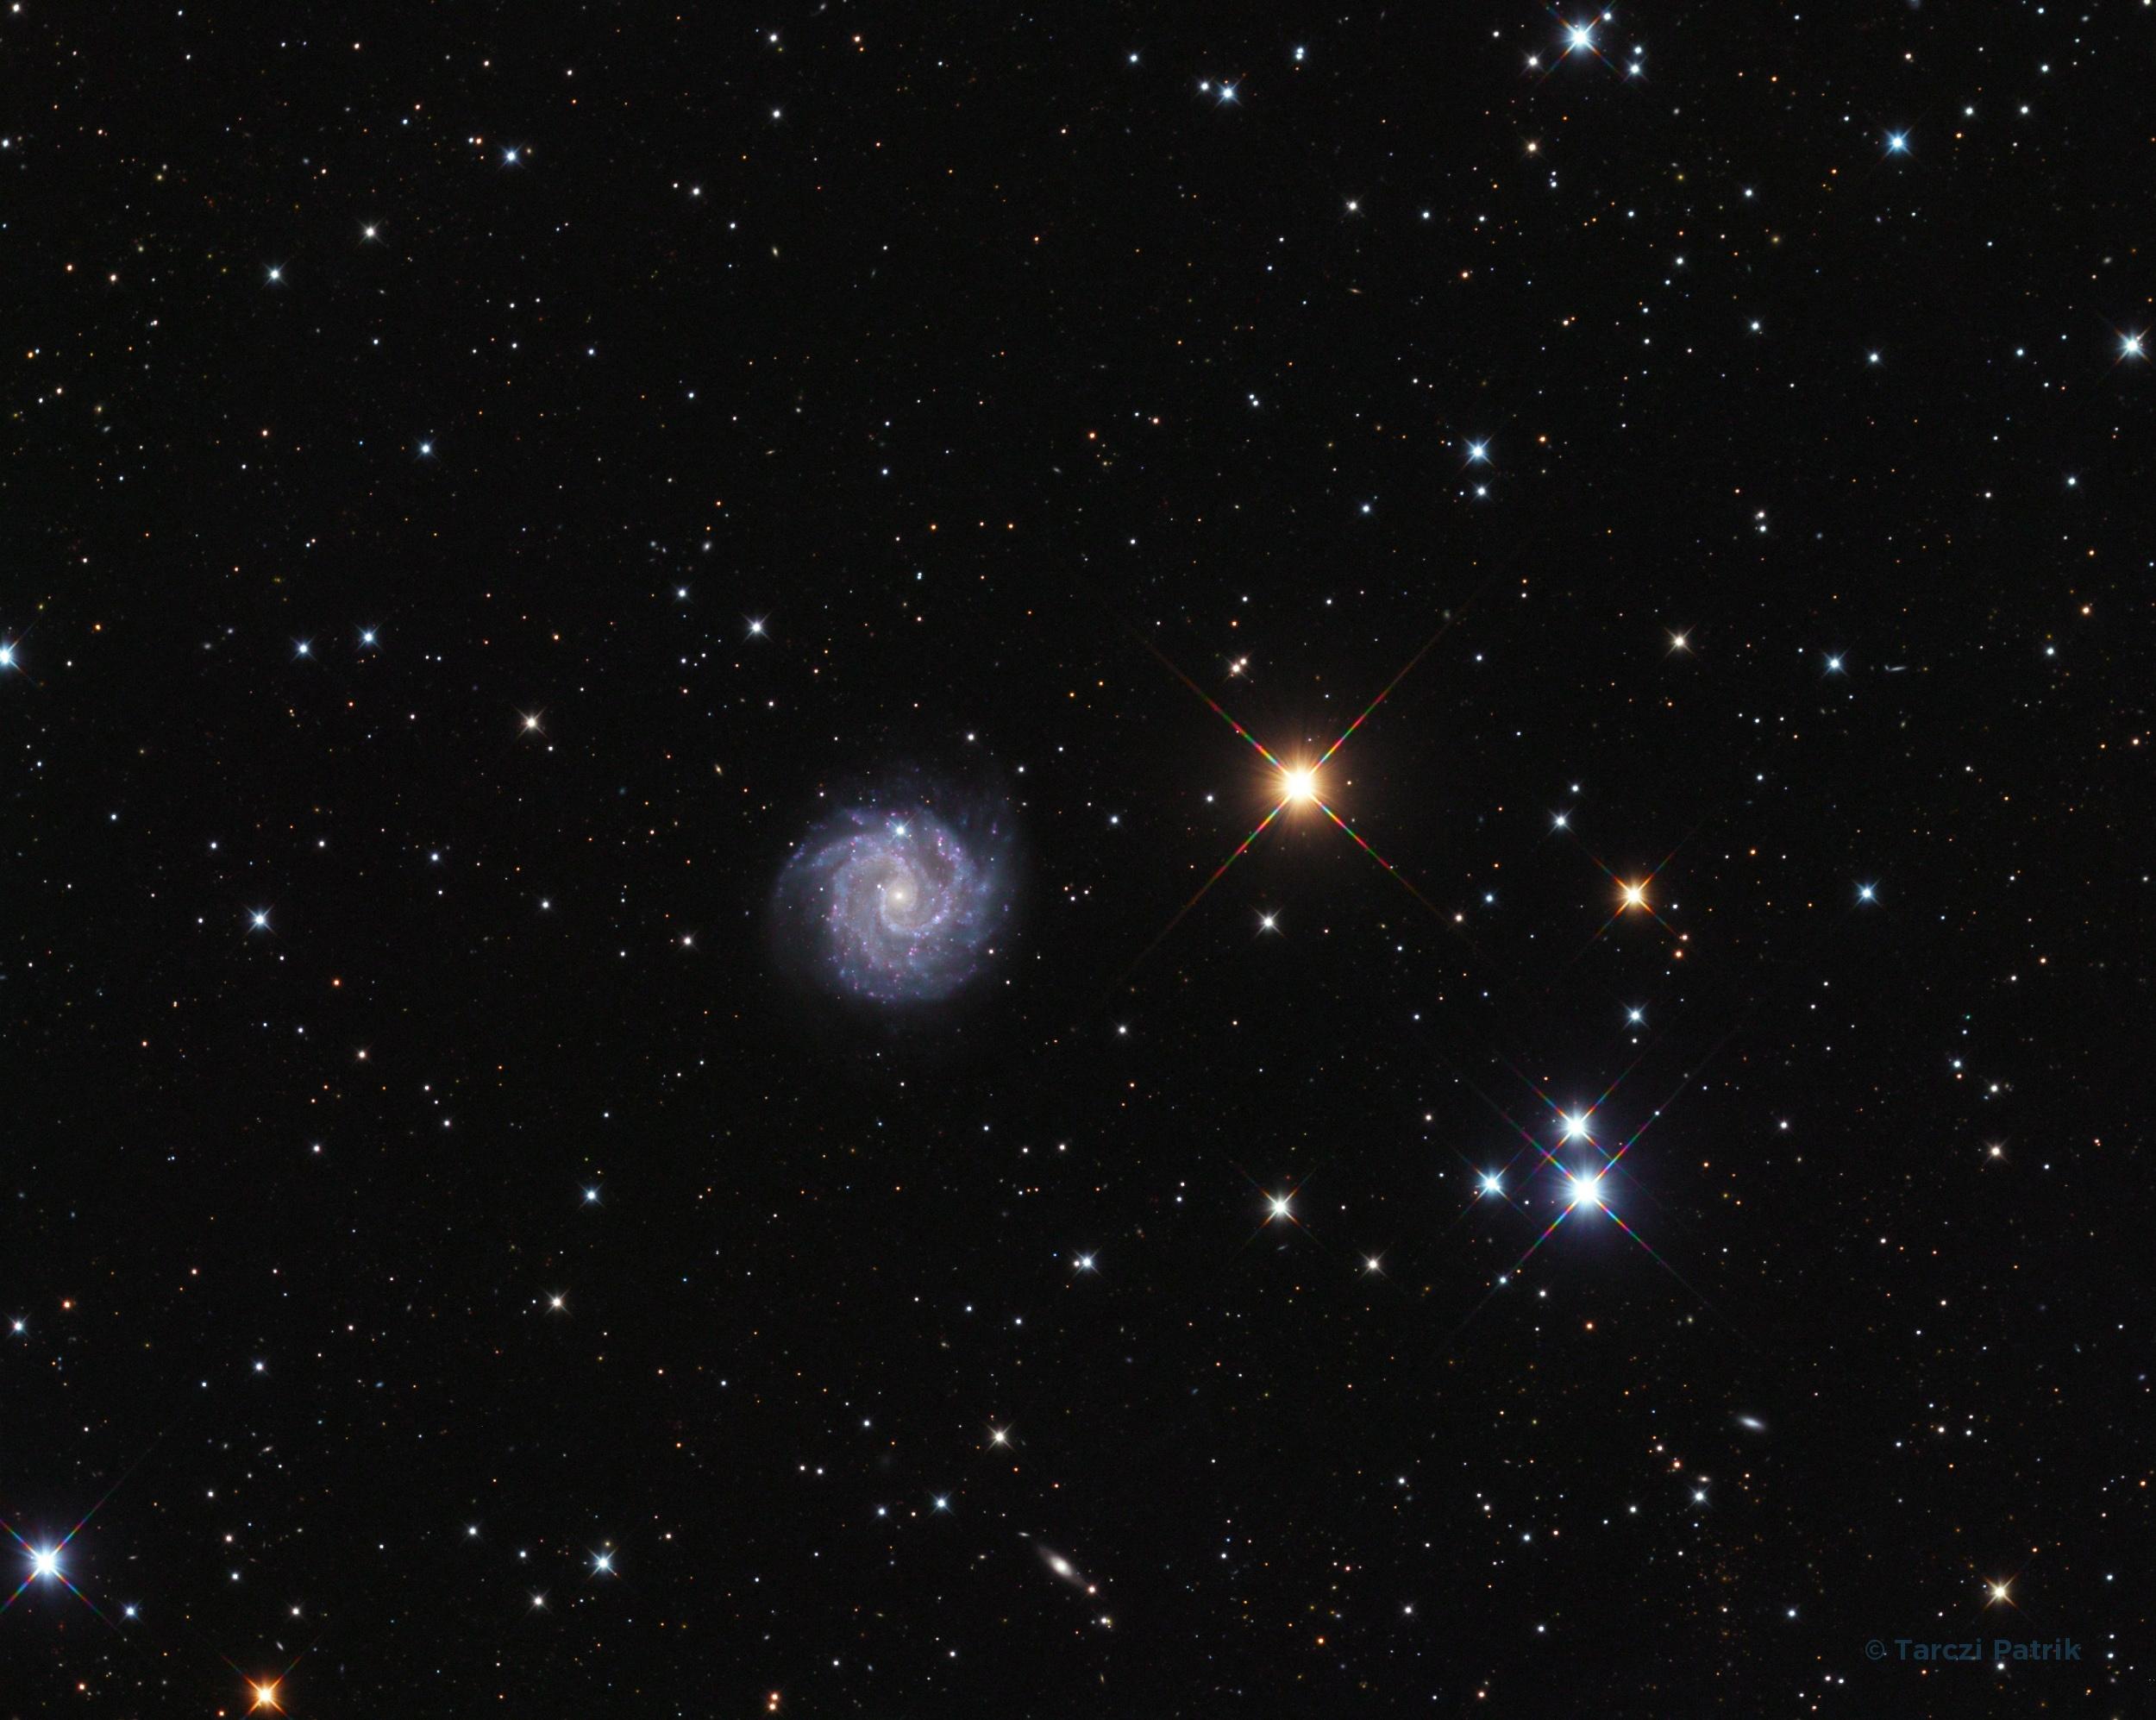 Az NGC3184 jelű galaxis